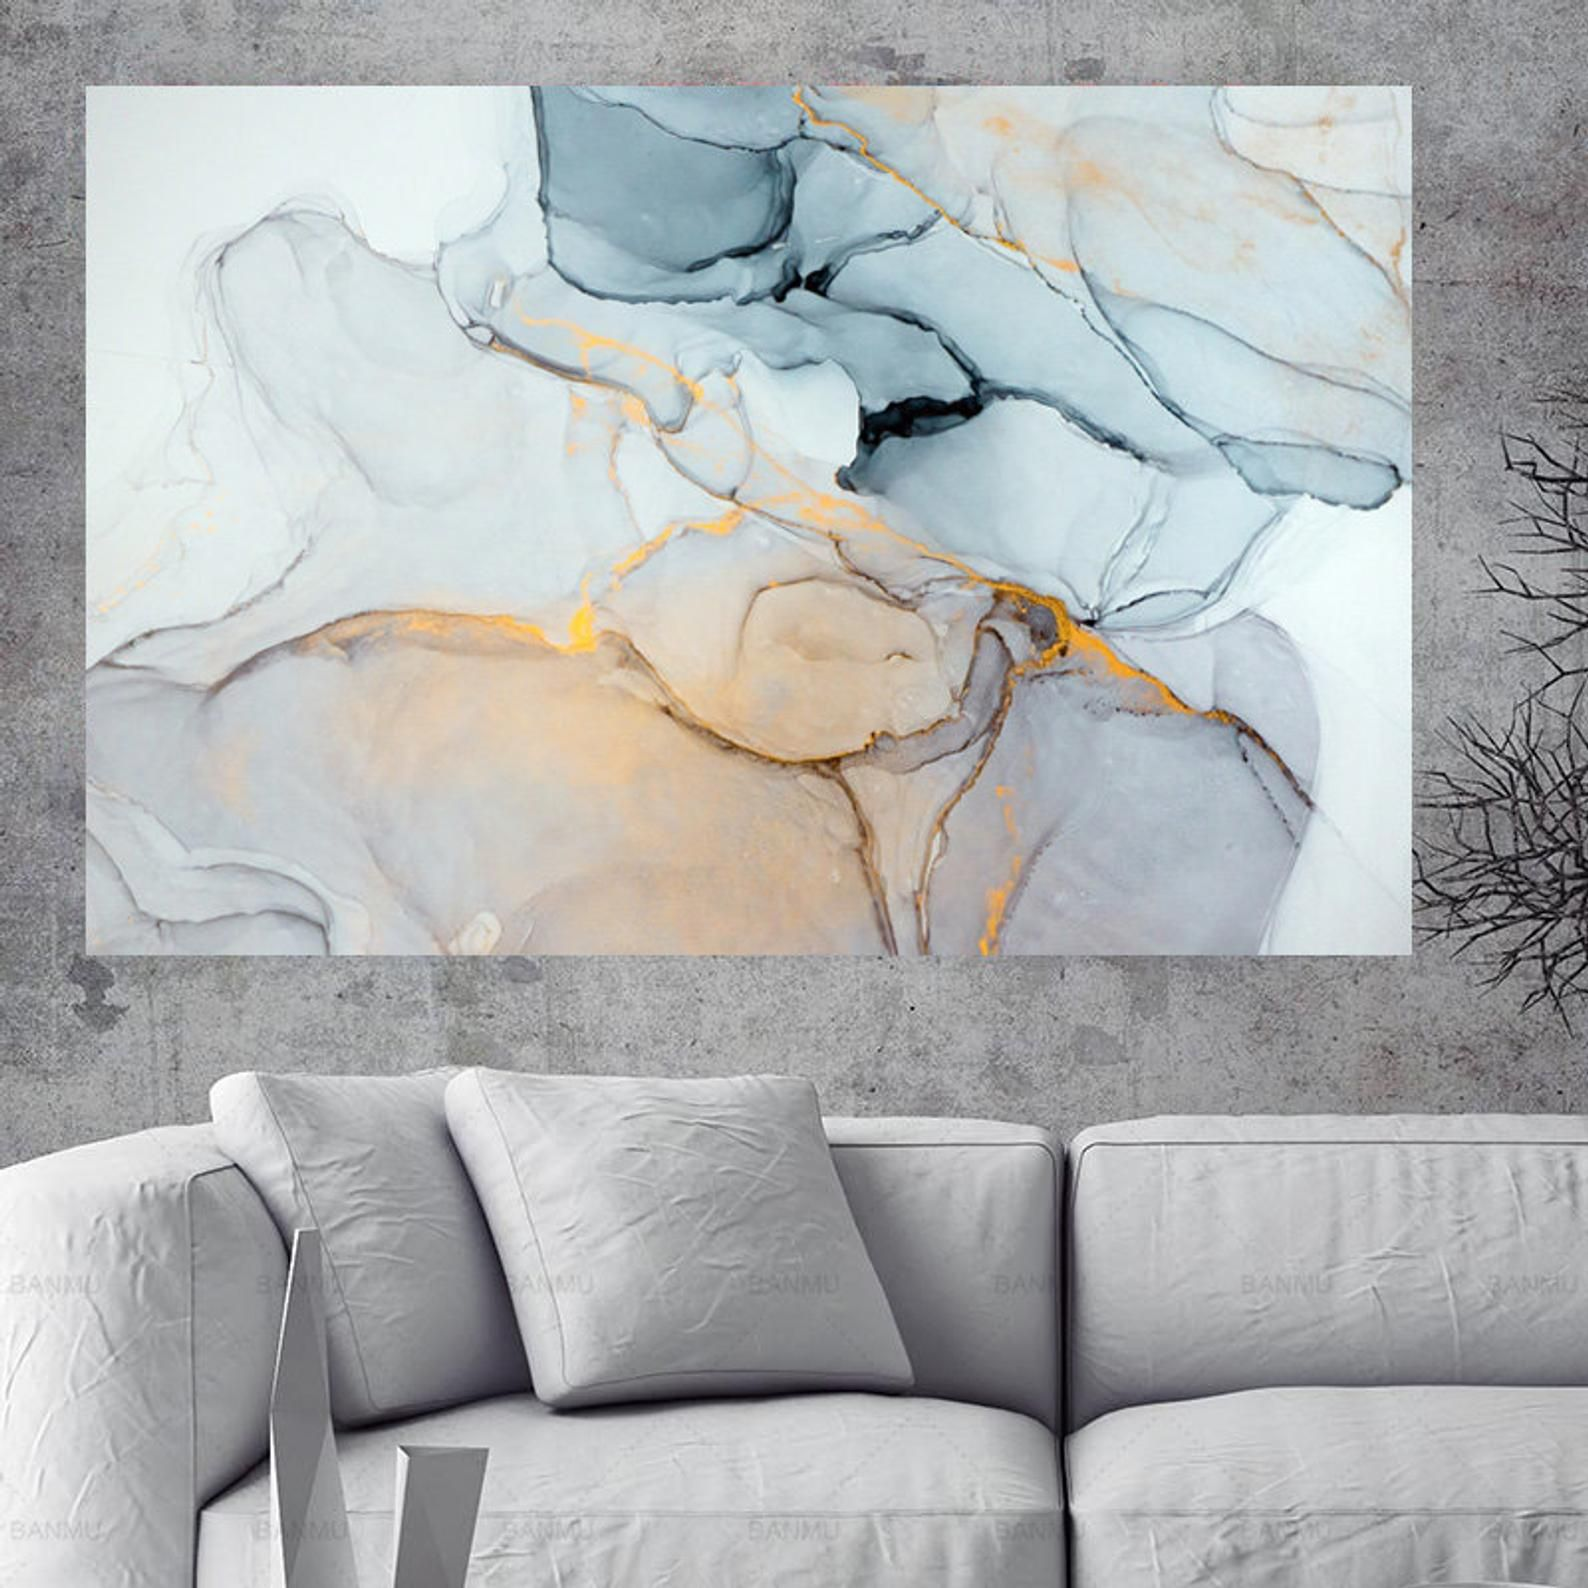 Marble Wall Art Large Marble Art Print Acrylic Painting Modern Wall Art Painting Abstract Painting Print Abstract Wall Art Printable Downoad Modern Abstract Print Large Art Prints Abstract Painting Print